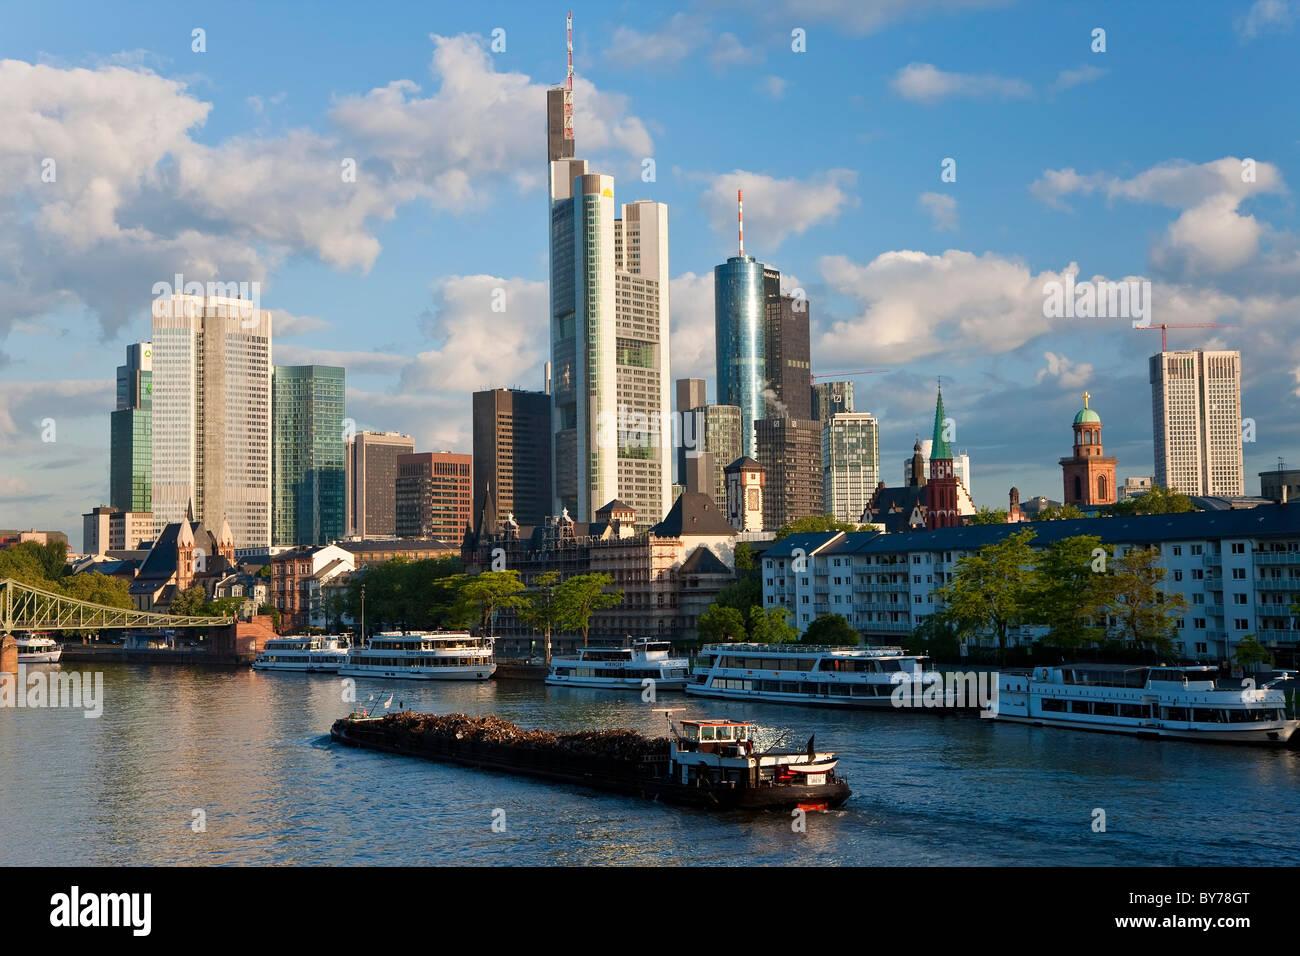 Skyline & Main River early morning, Frankfurt, Hesse, Germany, Europe - Stock Image